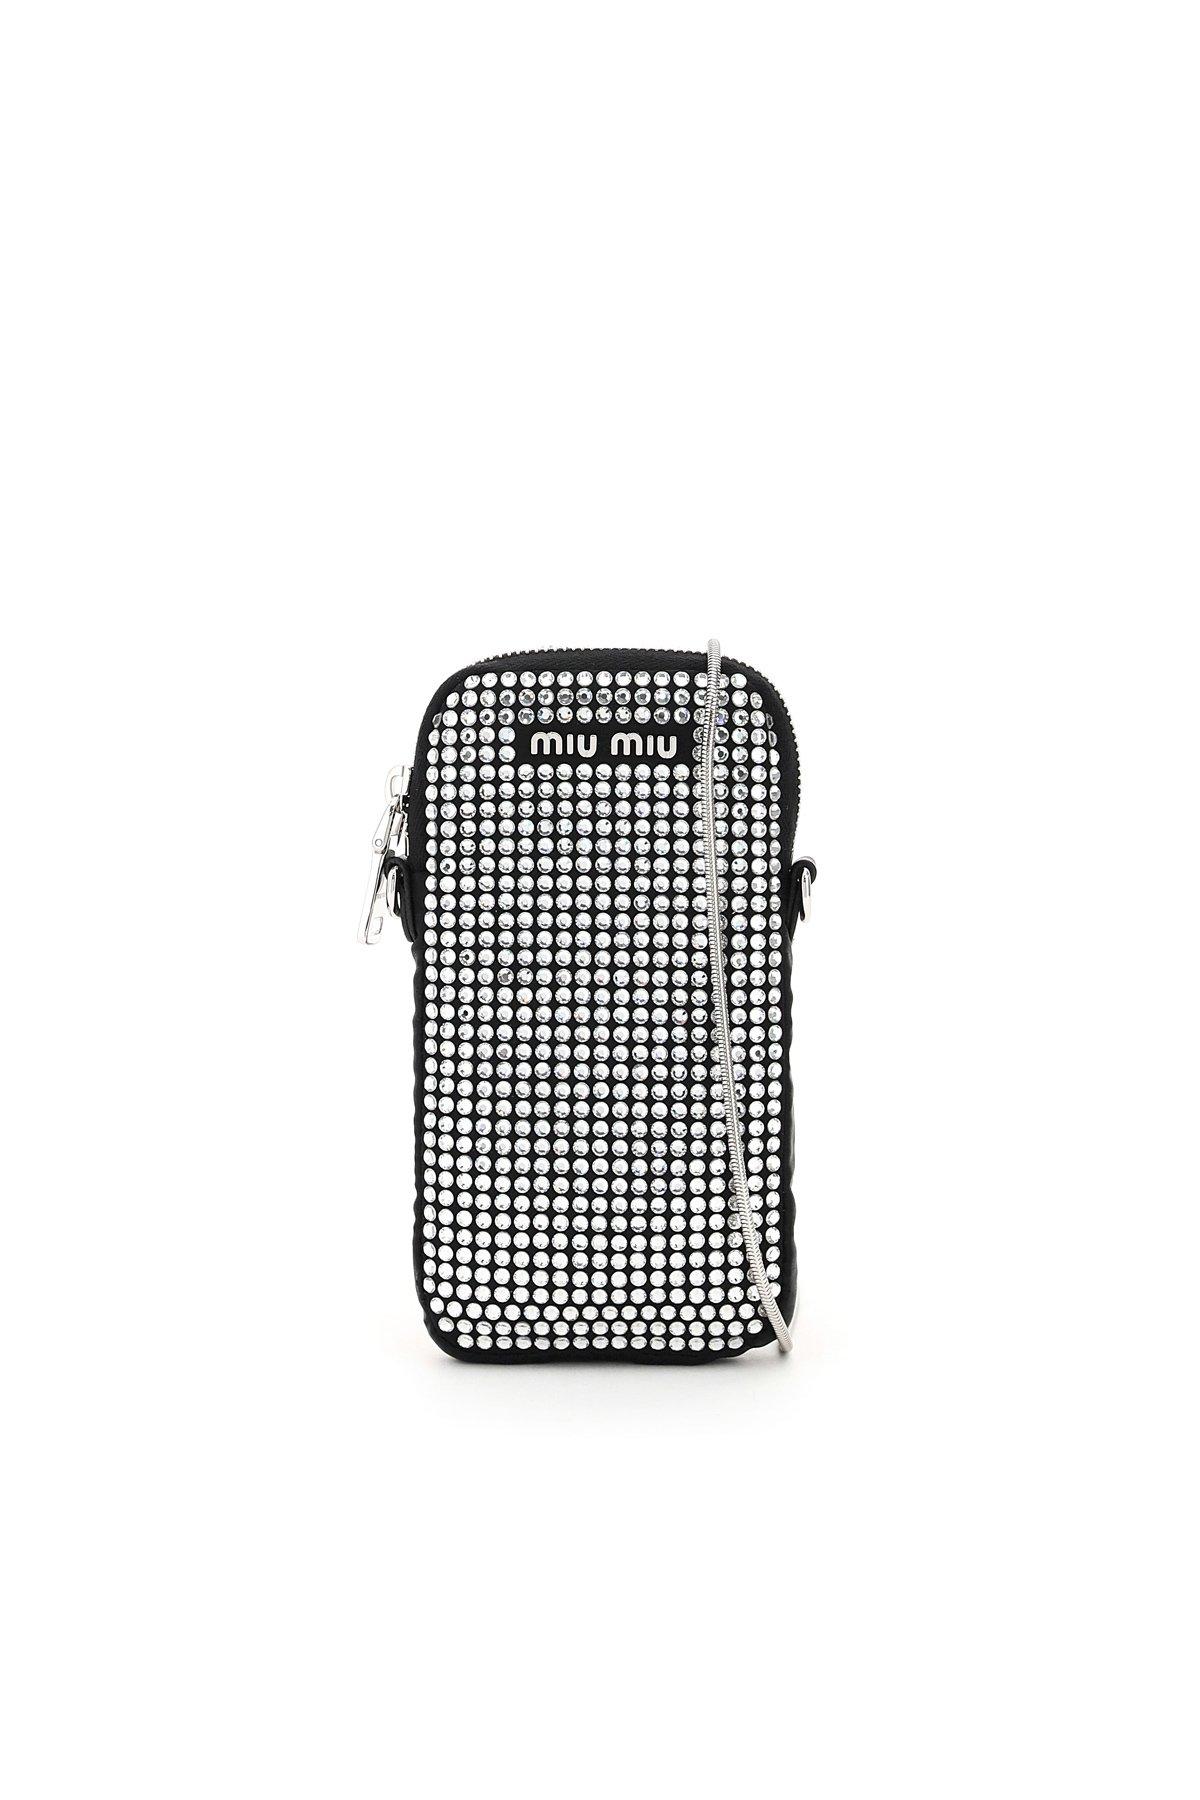 Miu miu mini bag phone holder starlight